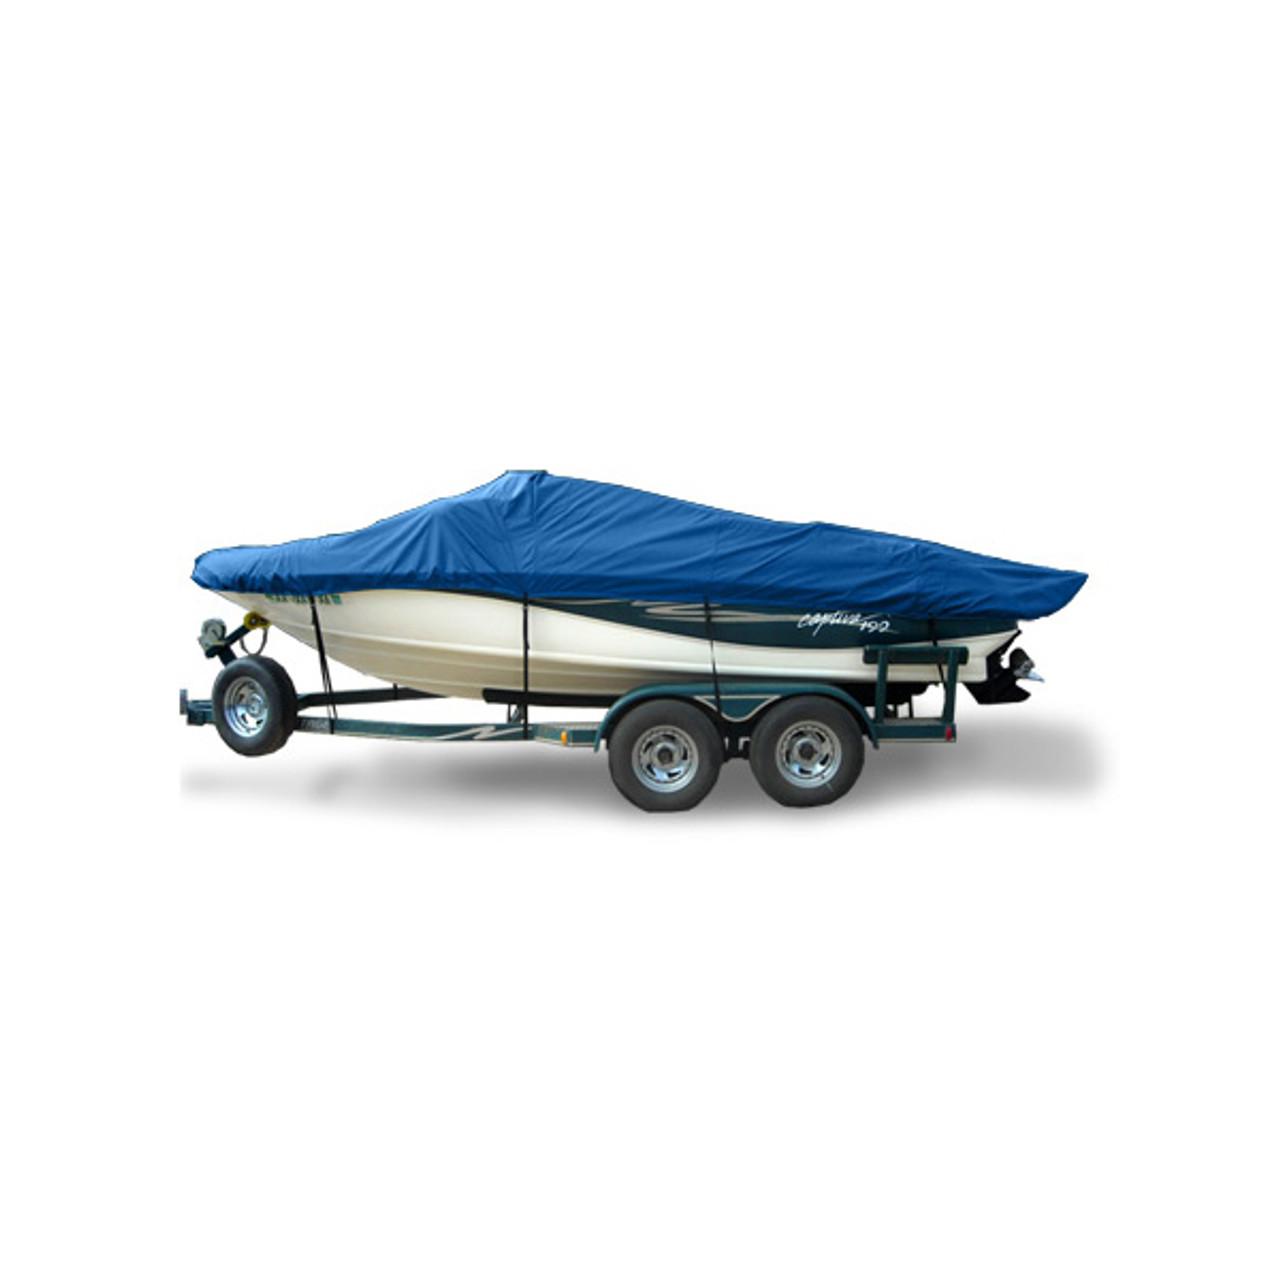 2006 2009 mastercraft 230 maristar swim platform i b custom boat cover [ 1280 x 1280 Pixel ]